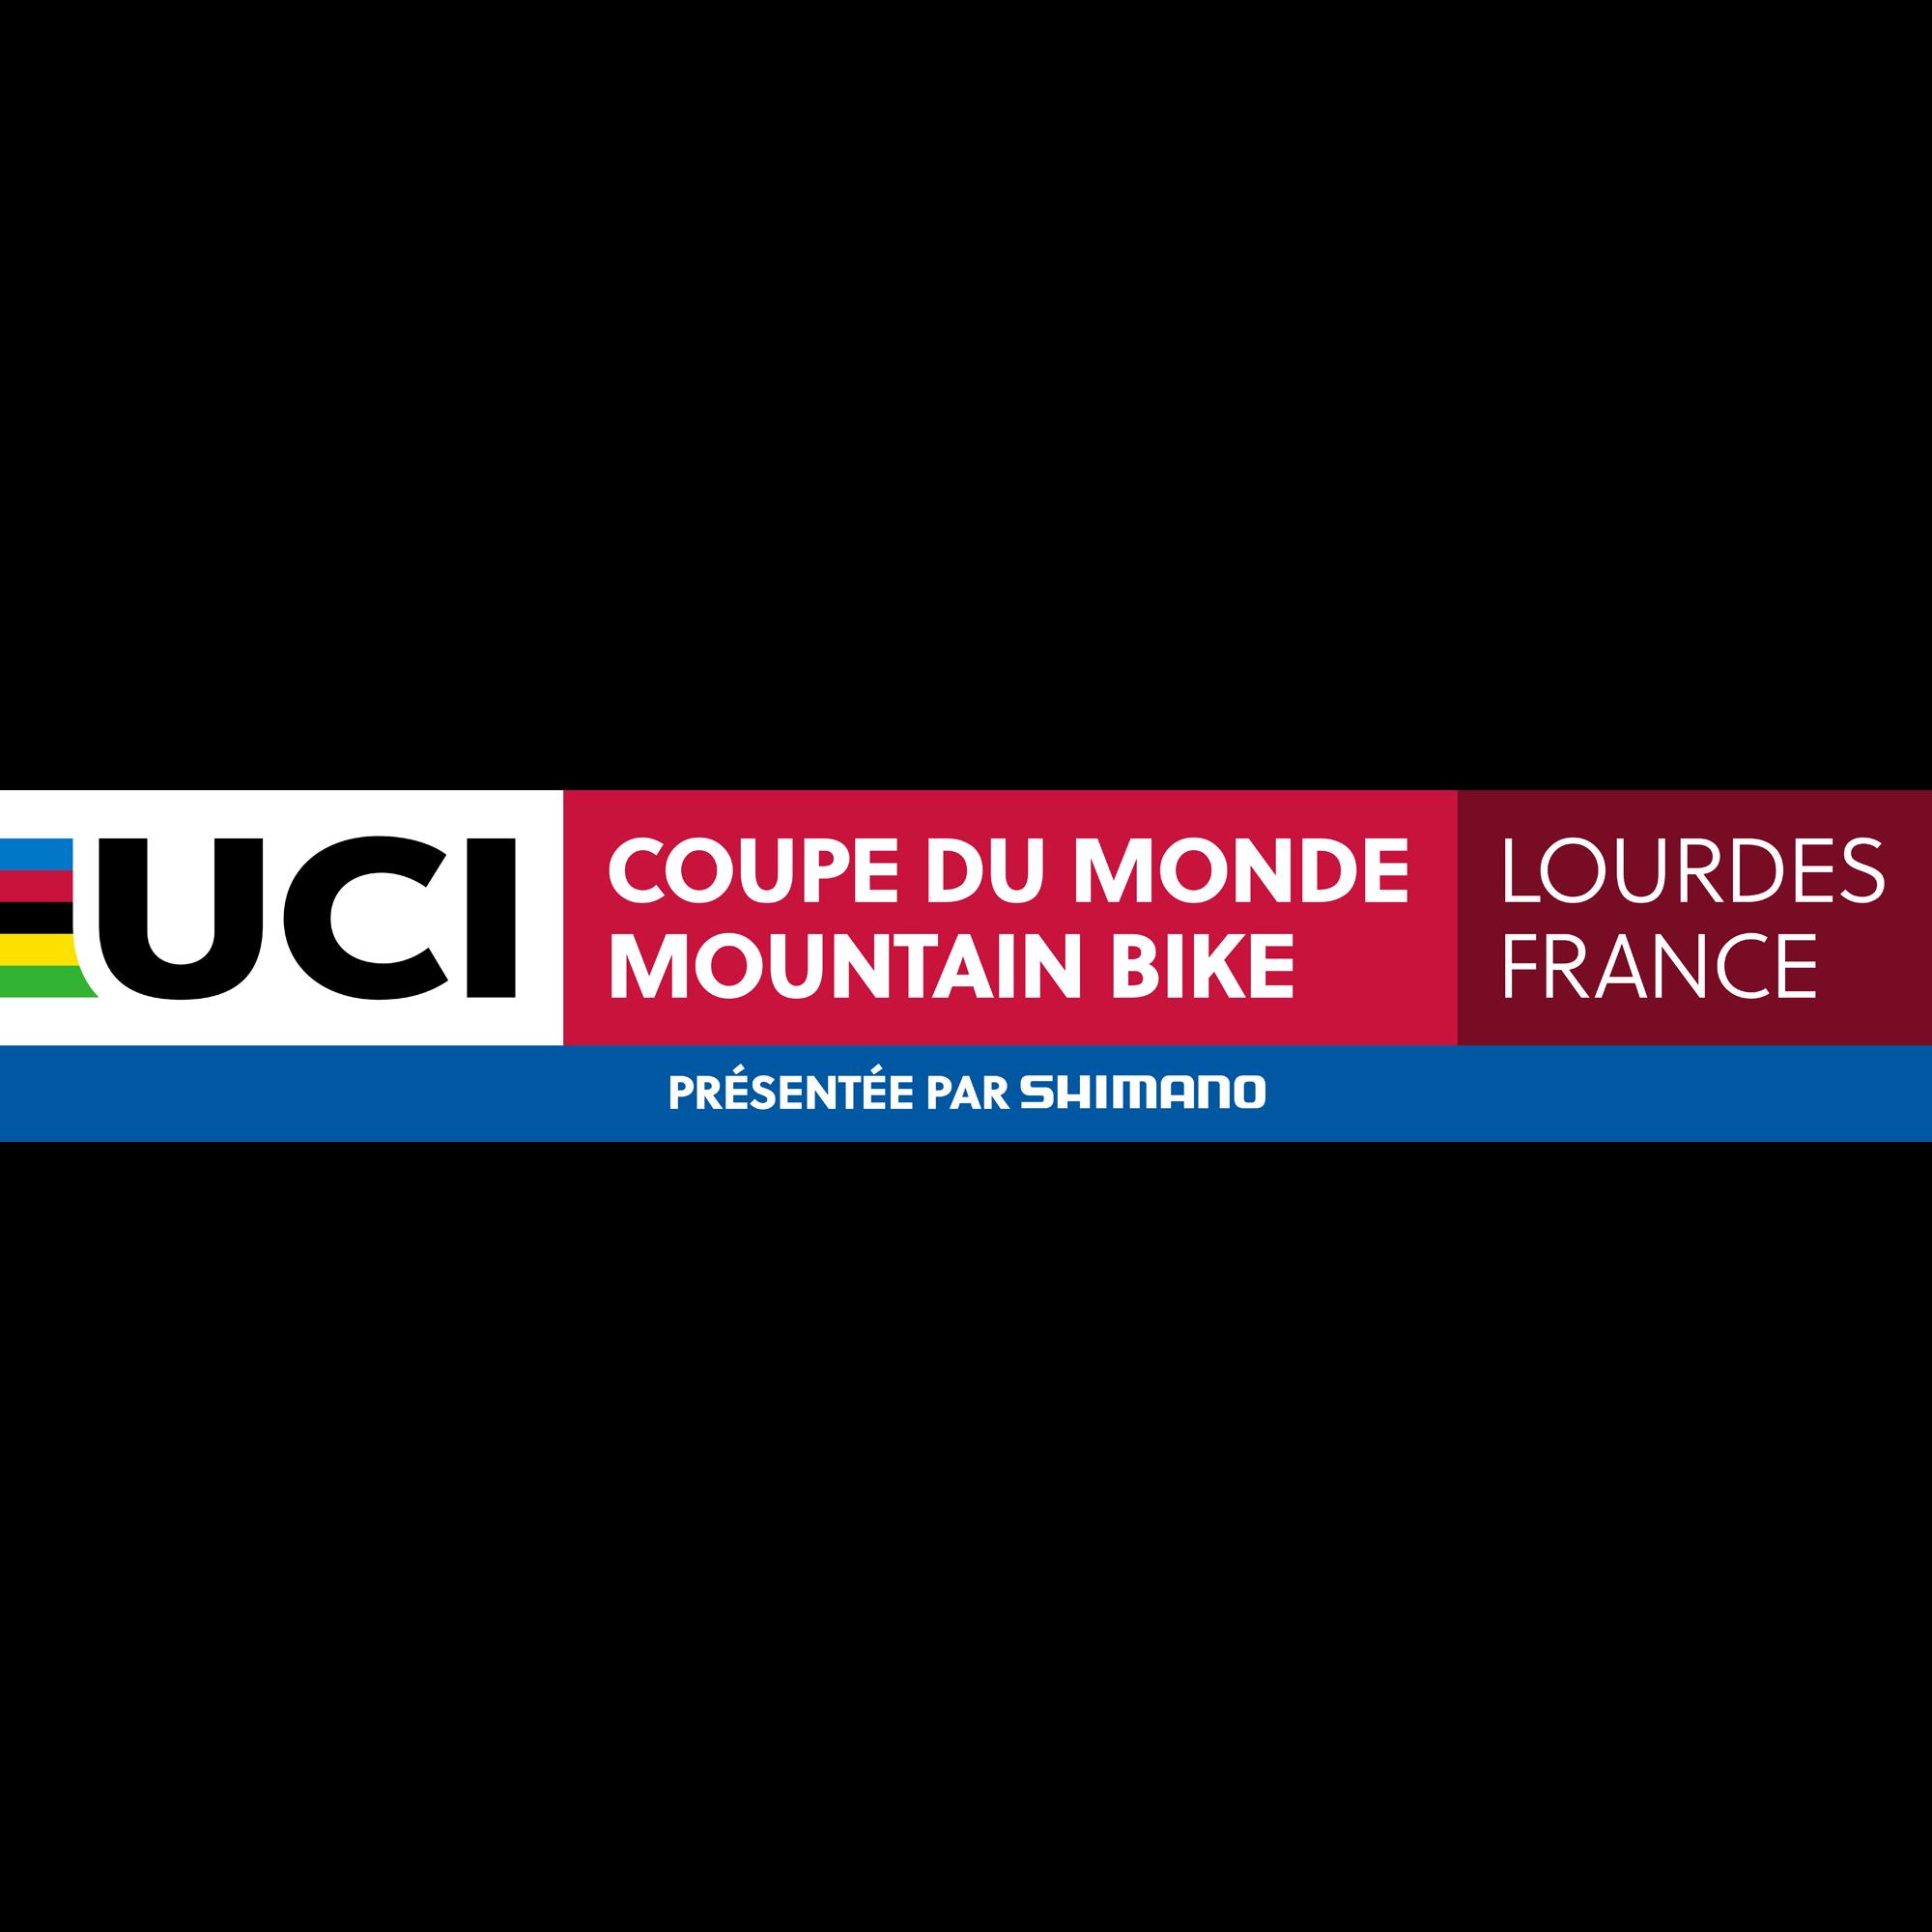 2016 UCI Mountain Bike World Cup